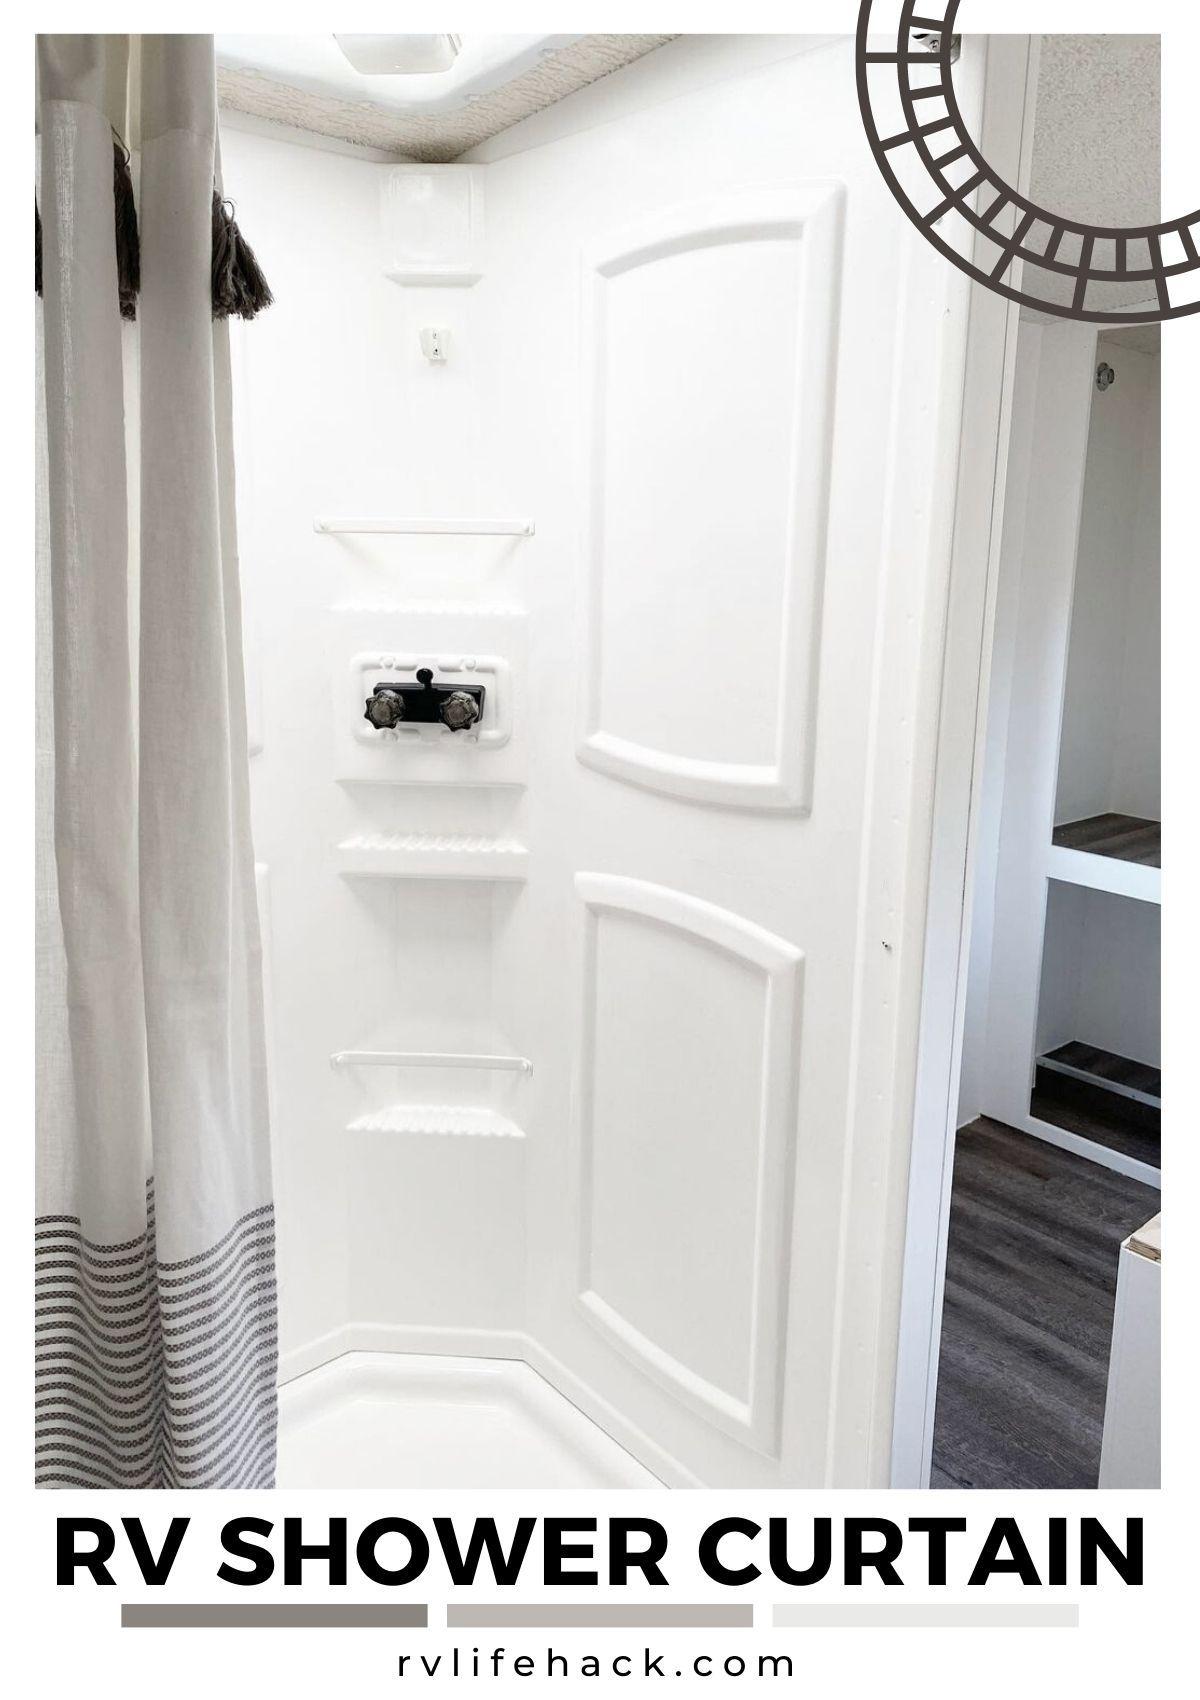 rv shower curtain ideas rv outdoor